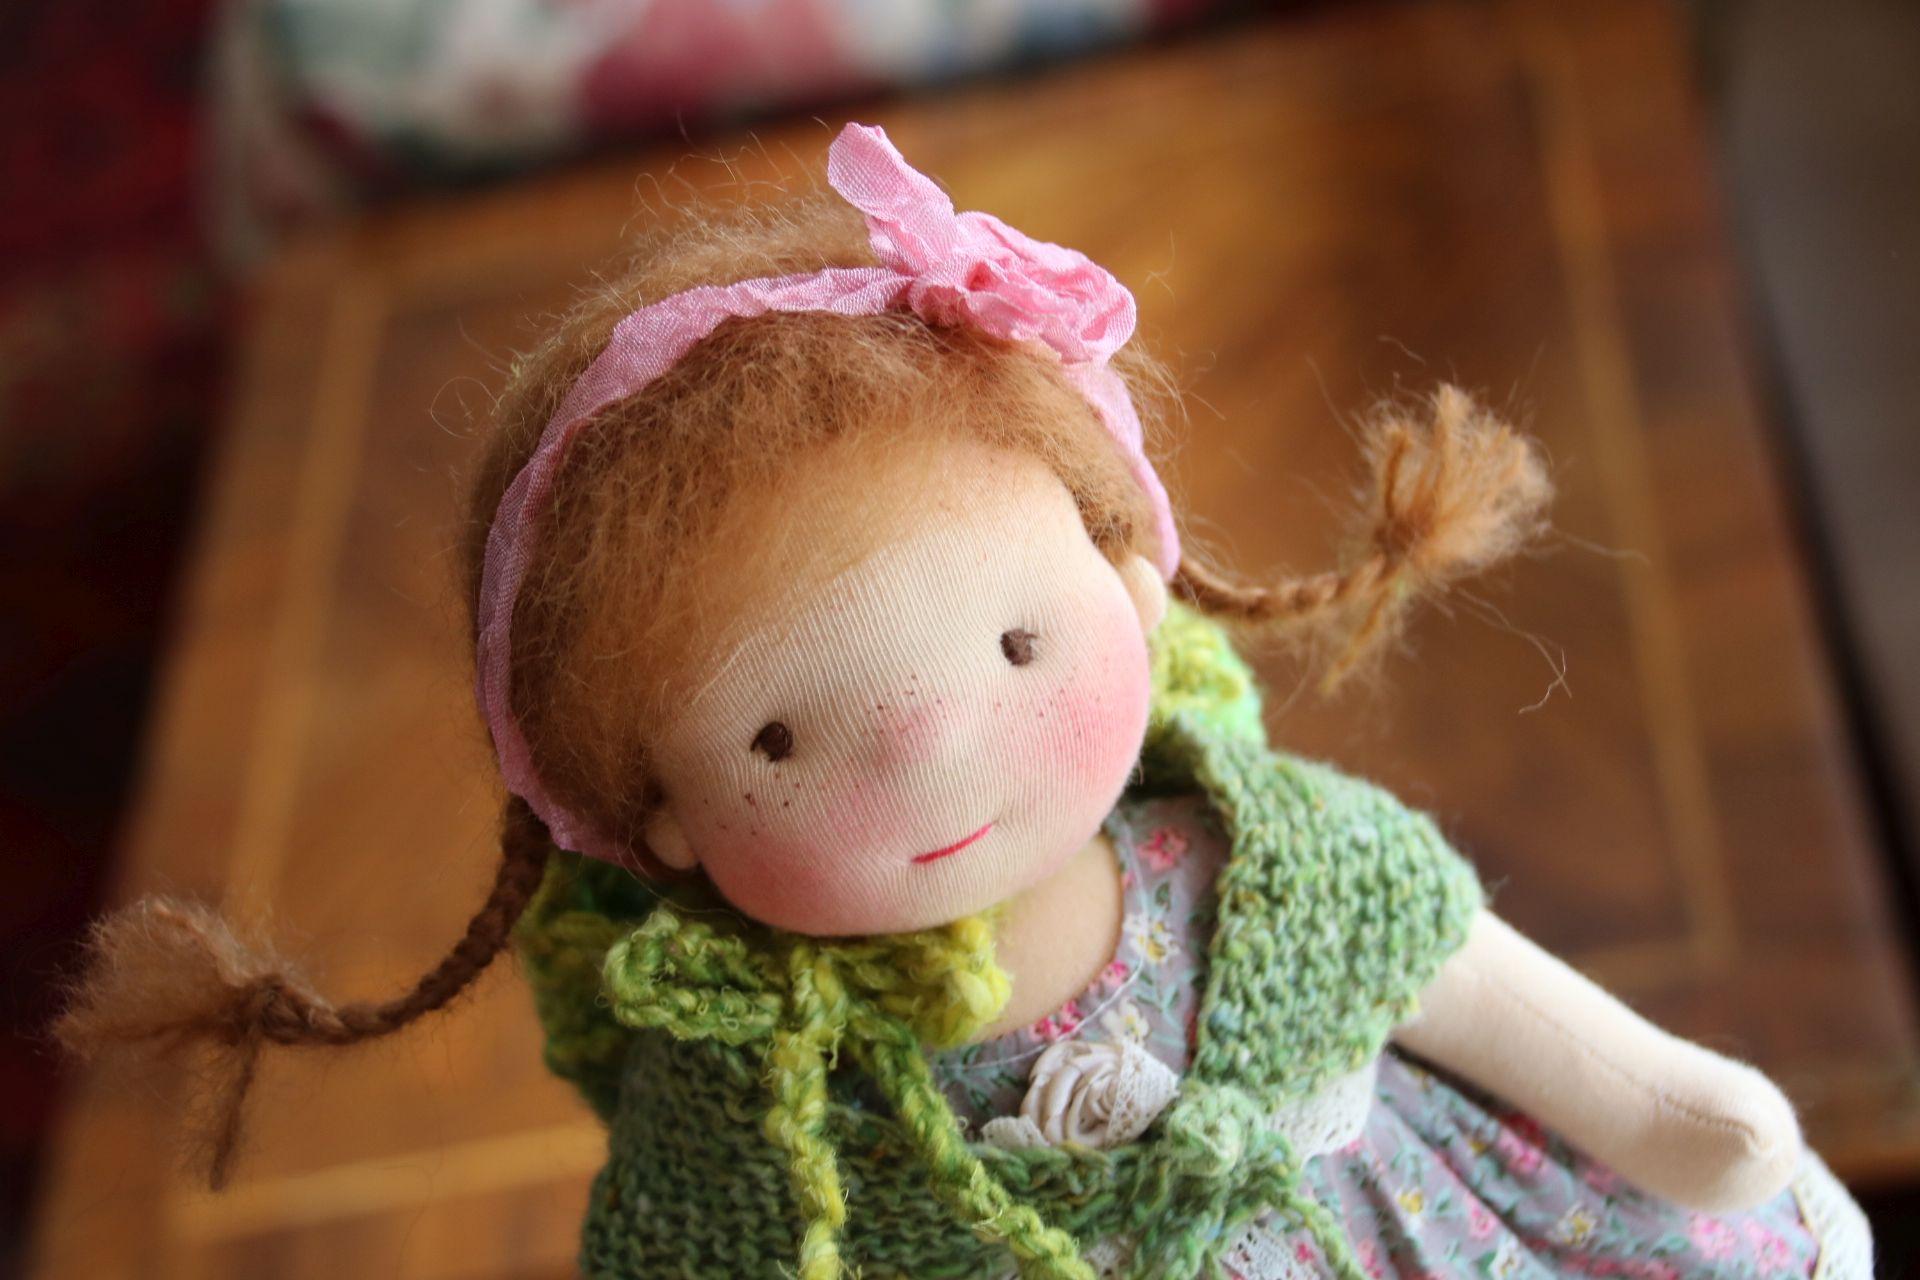 art doll, natural fibers art doll, OOAK Dolls, Waldorf Inspired Dolls and Toys